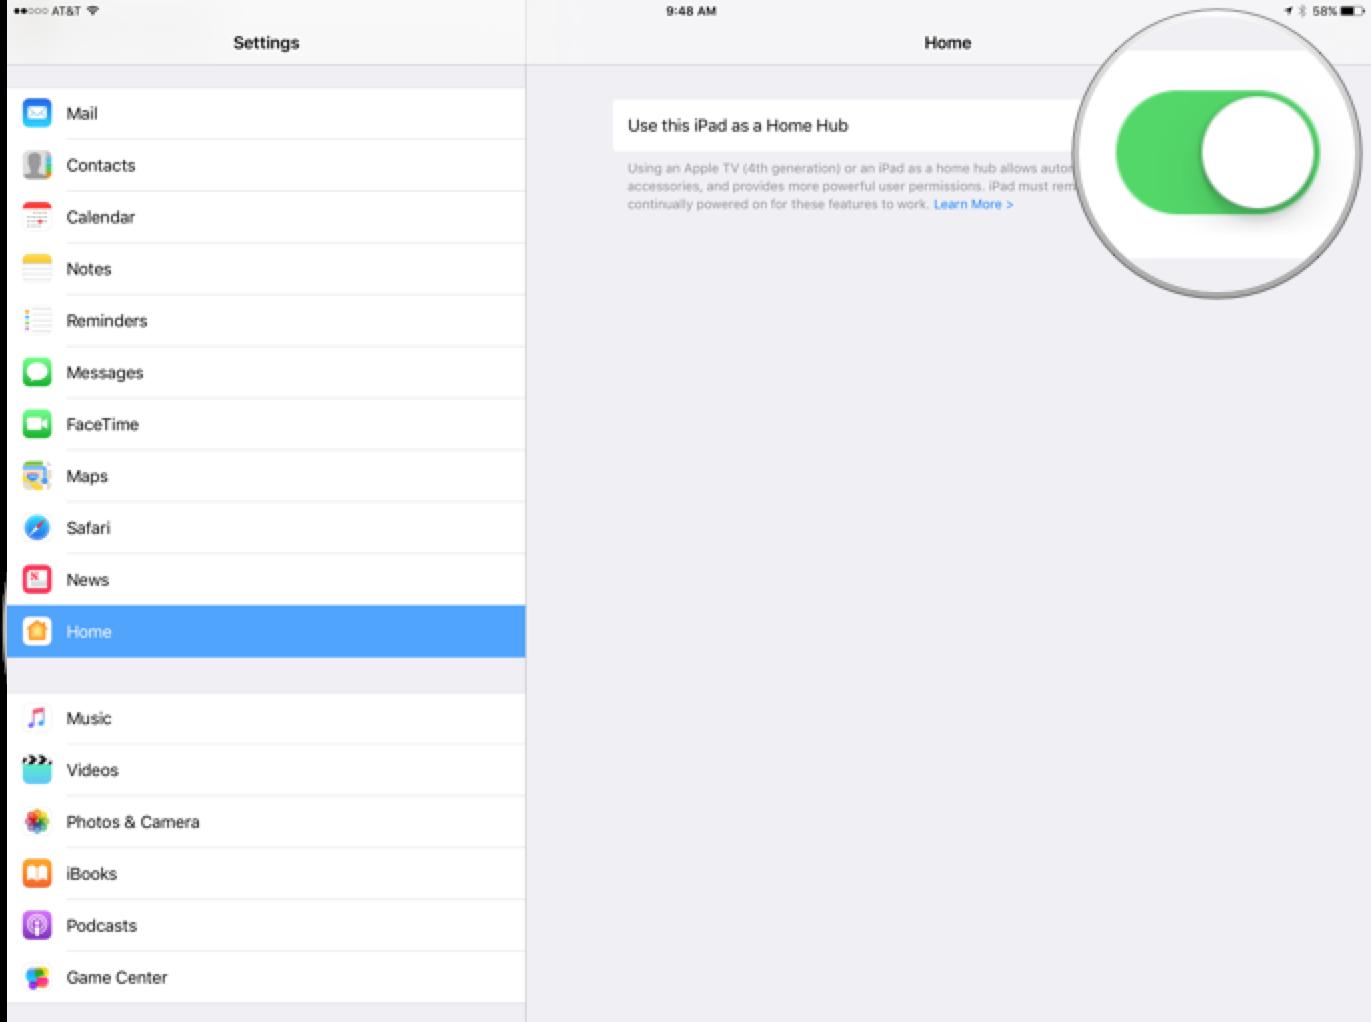 How to Make an Apple TV, iPad or HomePod a HomeKit Hub